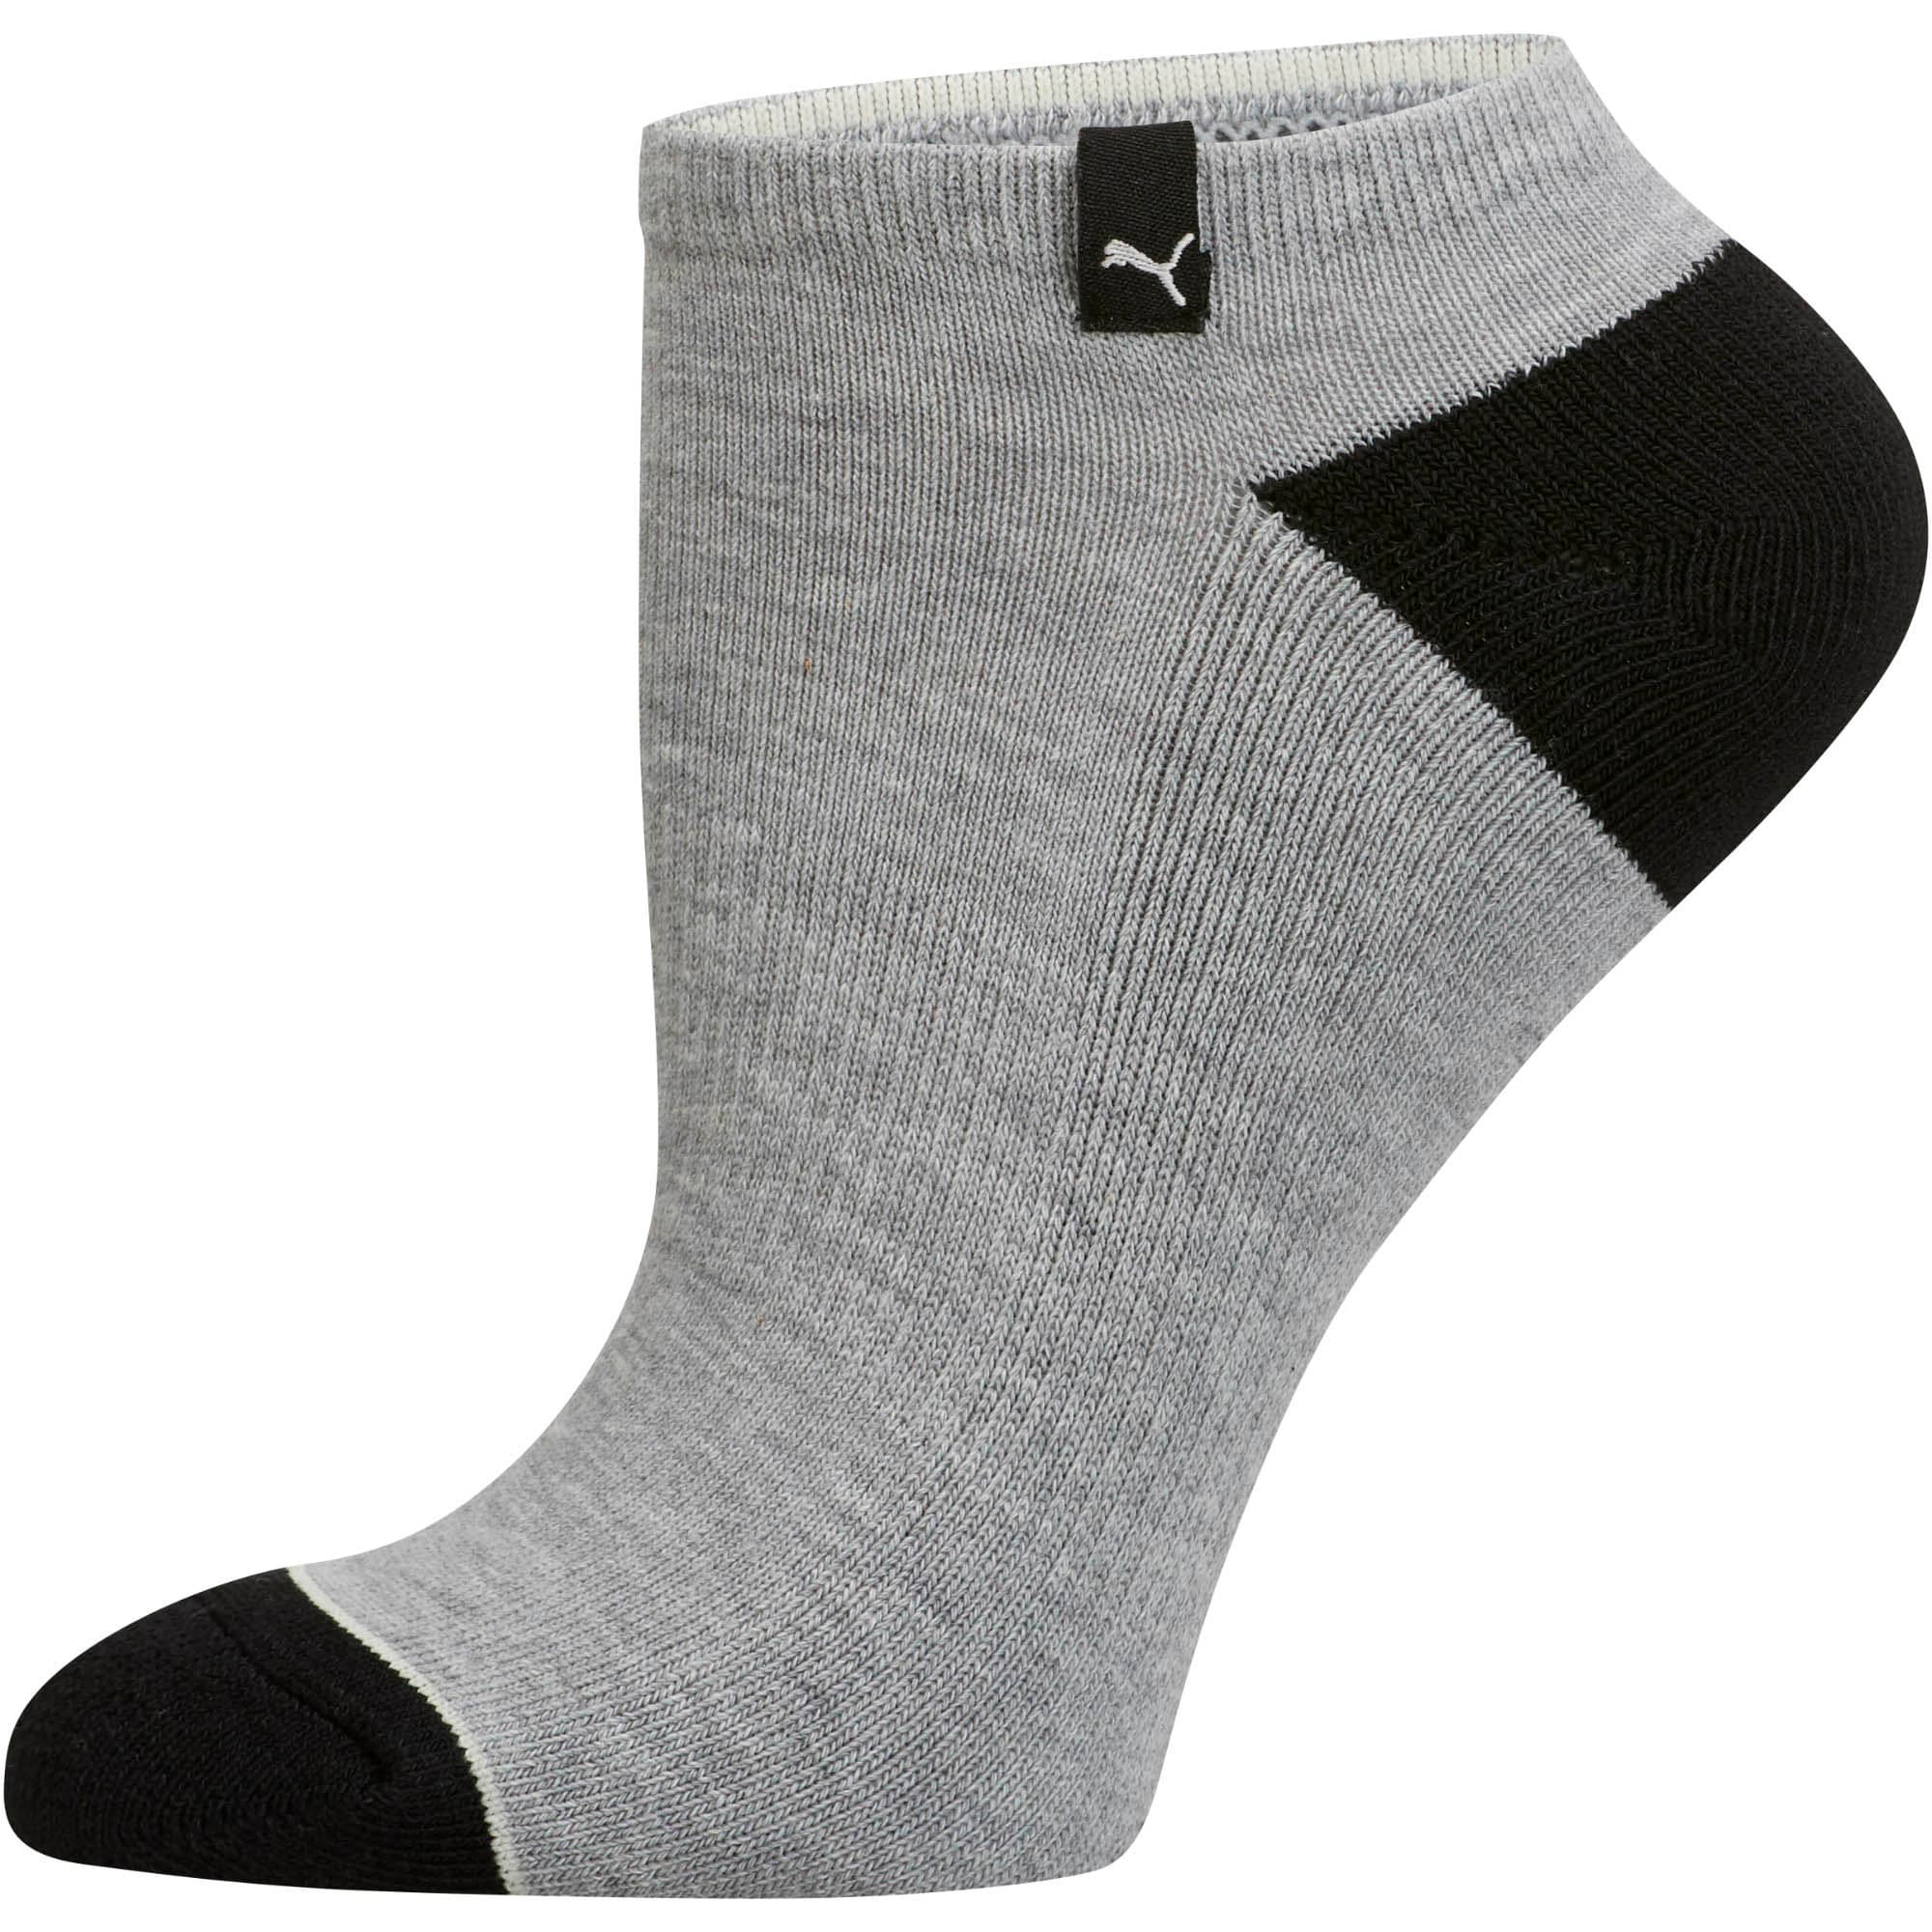 Thumbnail 4 of Women's No Show Socks (3 Pack), MD COMBO, medium